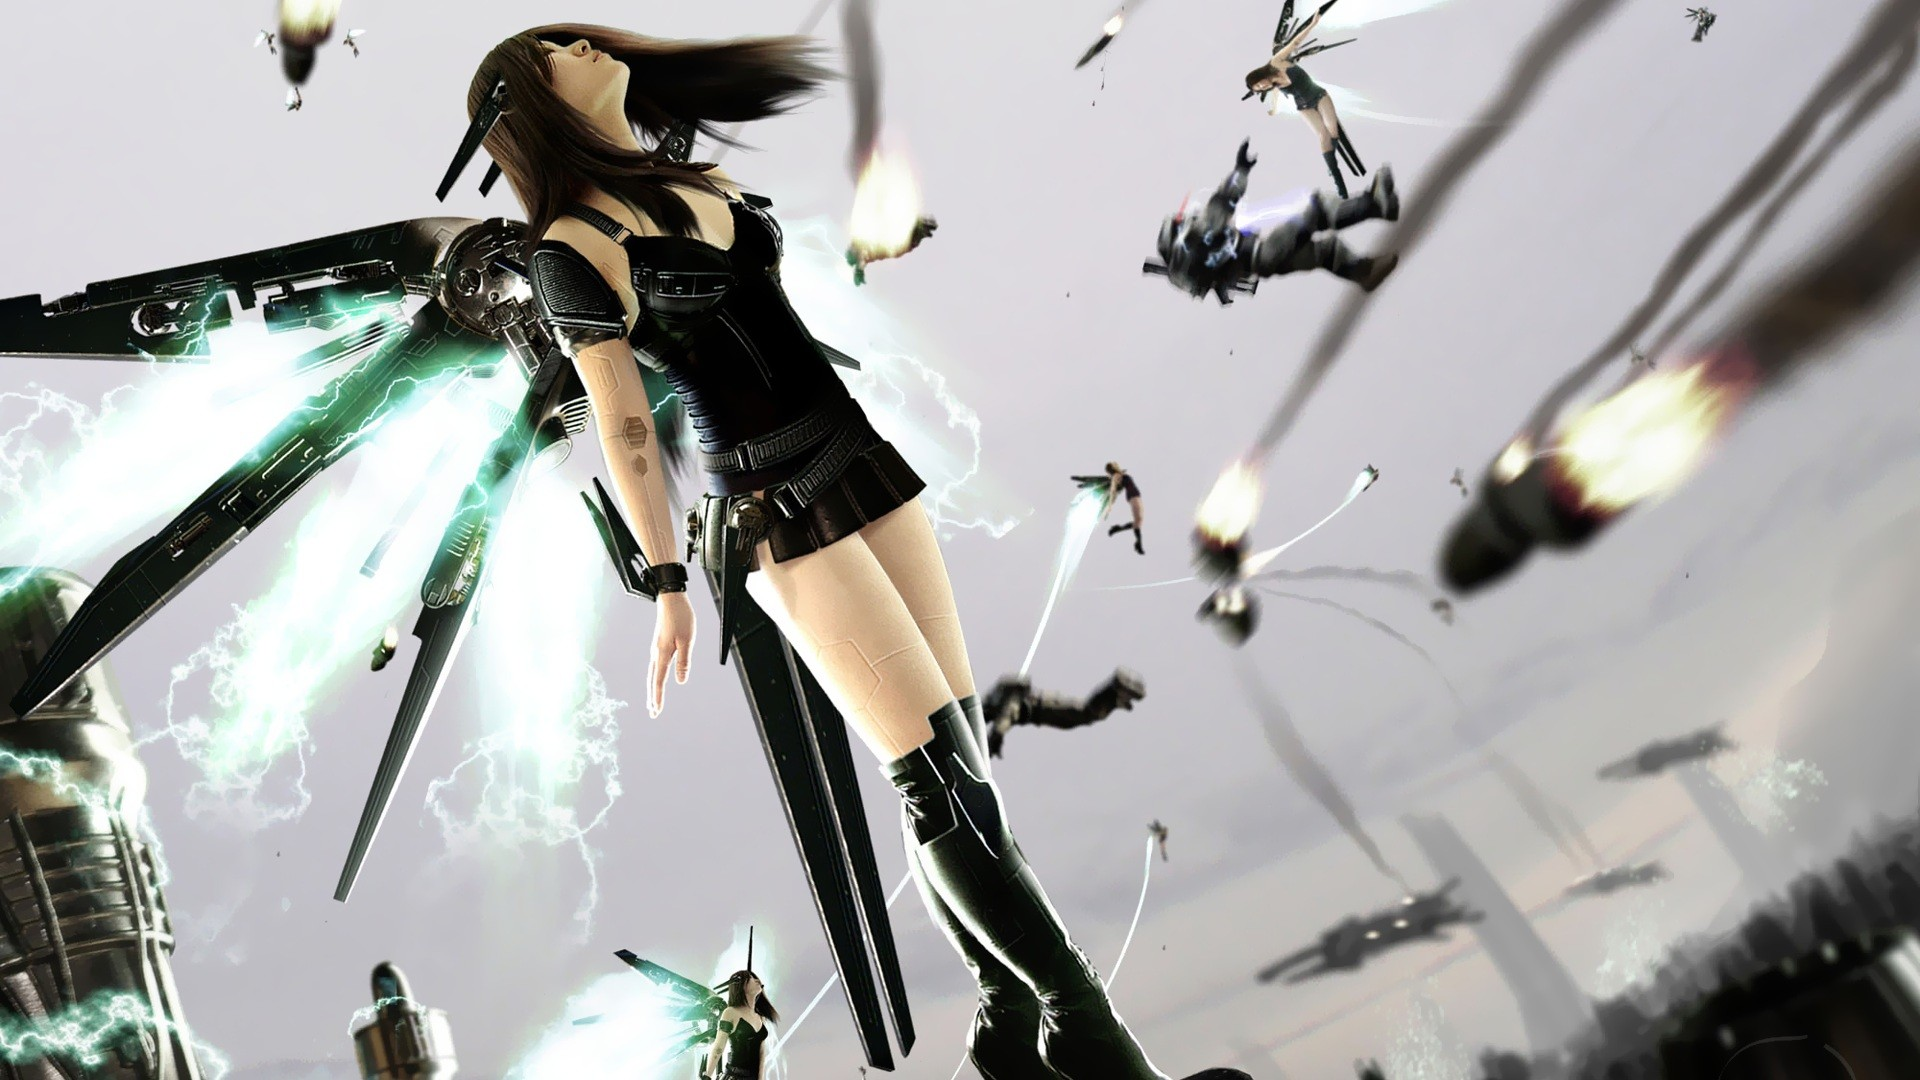 General 1920x1080 technology Hi-Tech flying women cyborg digital art science fiction long hair battle science fiction women futuristic legs dark hair standing machine